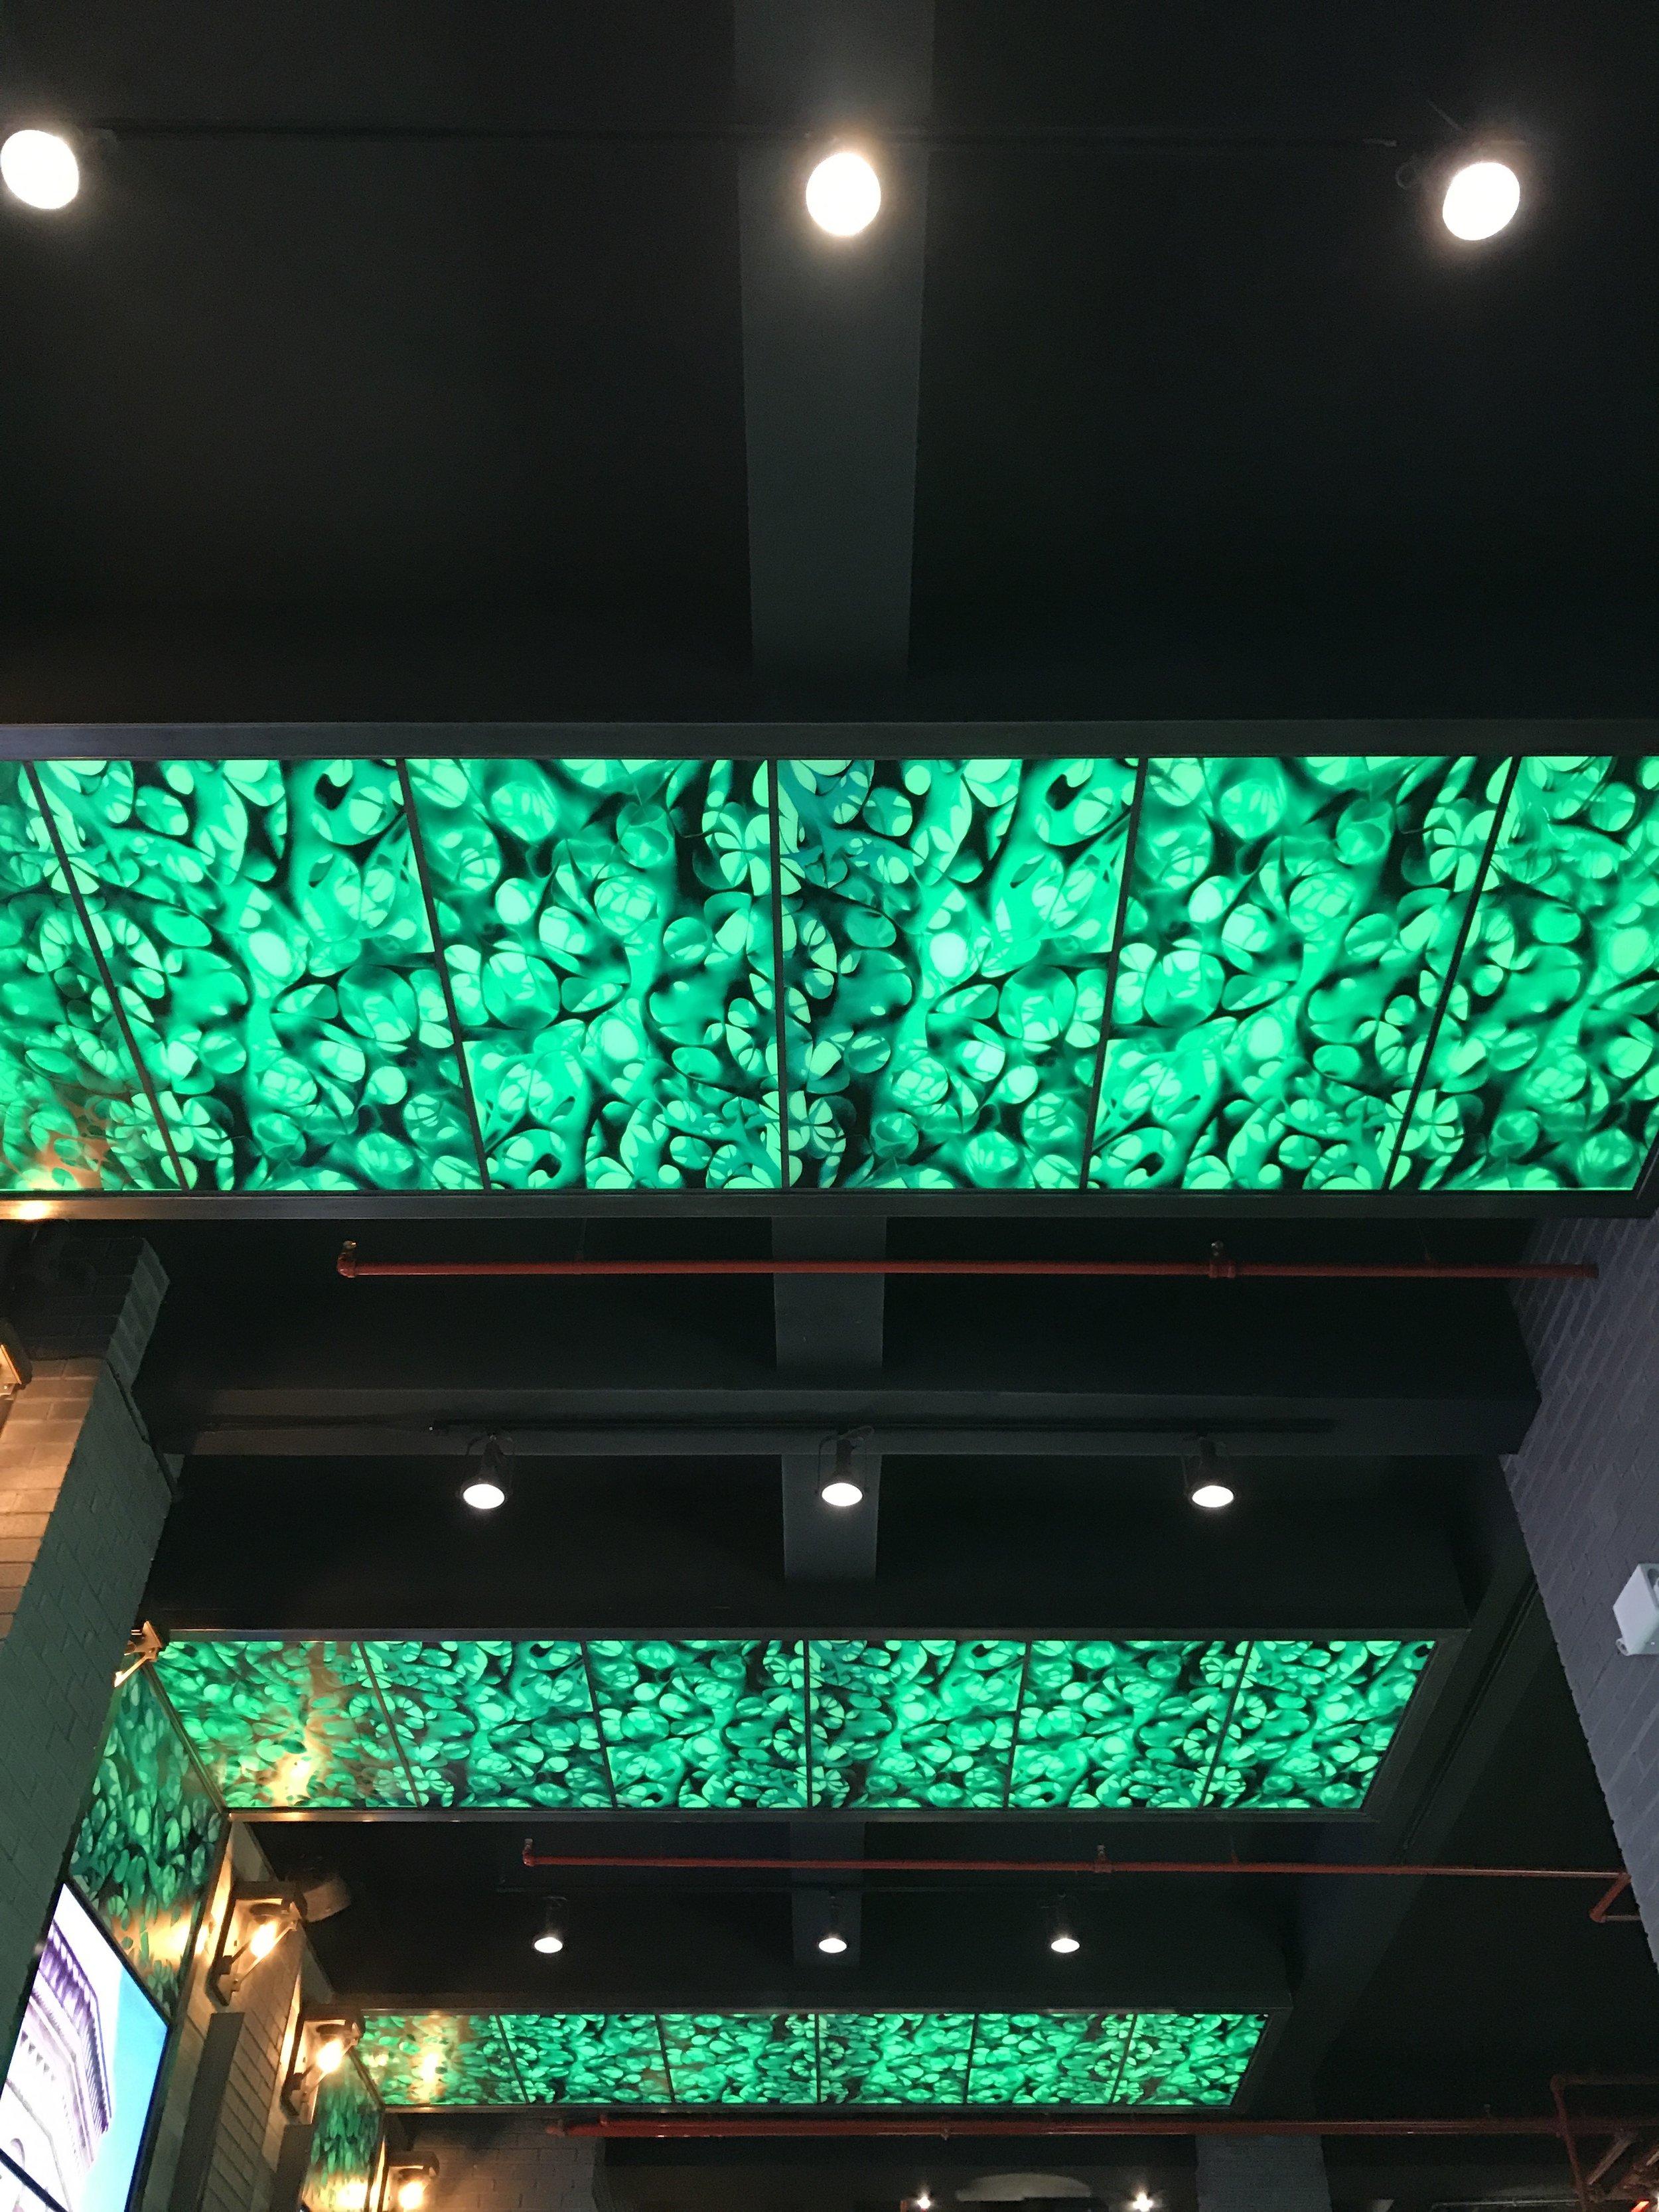 LED Lighting System,Gogi37, New York